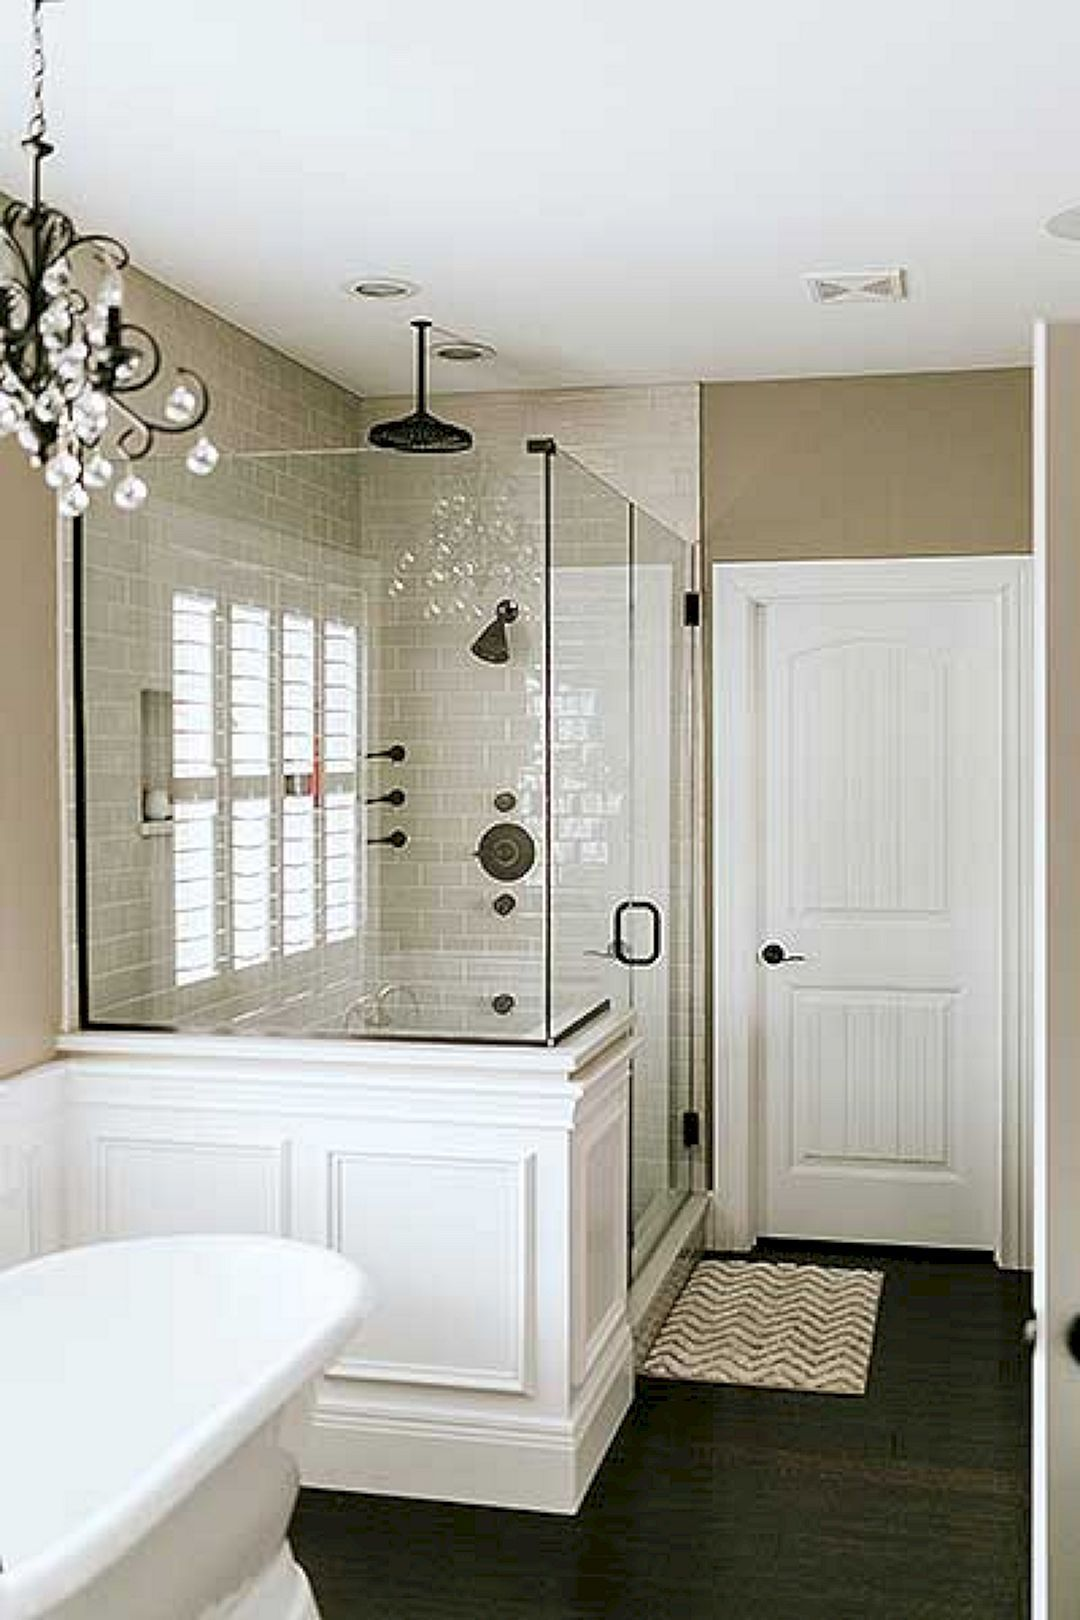 the best diy master bathroom ideas remodel on a budget no on bathroom renovation ideas 2020 id=68533